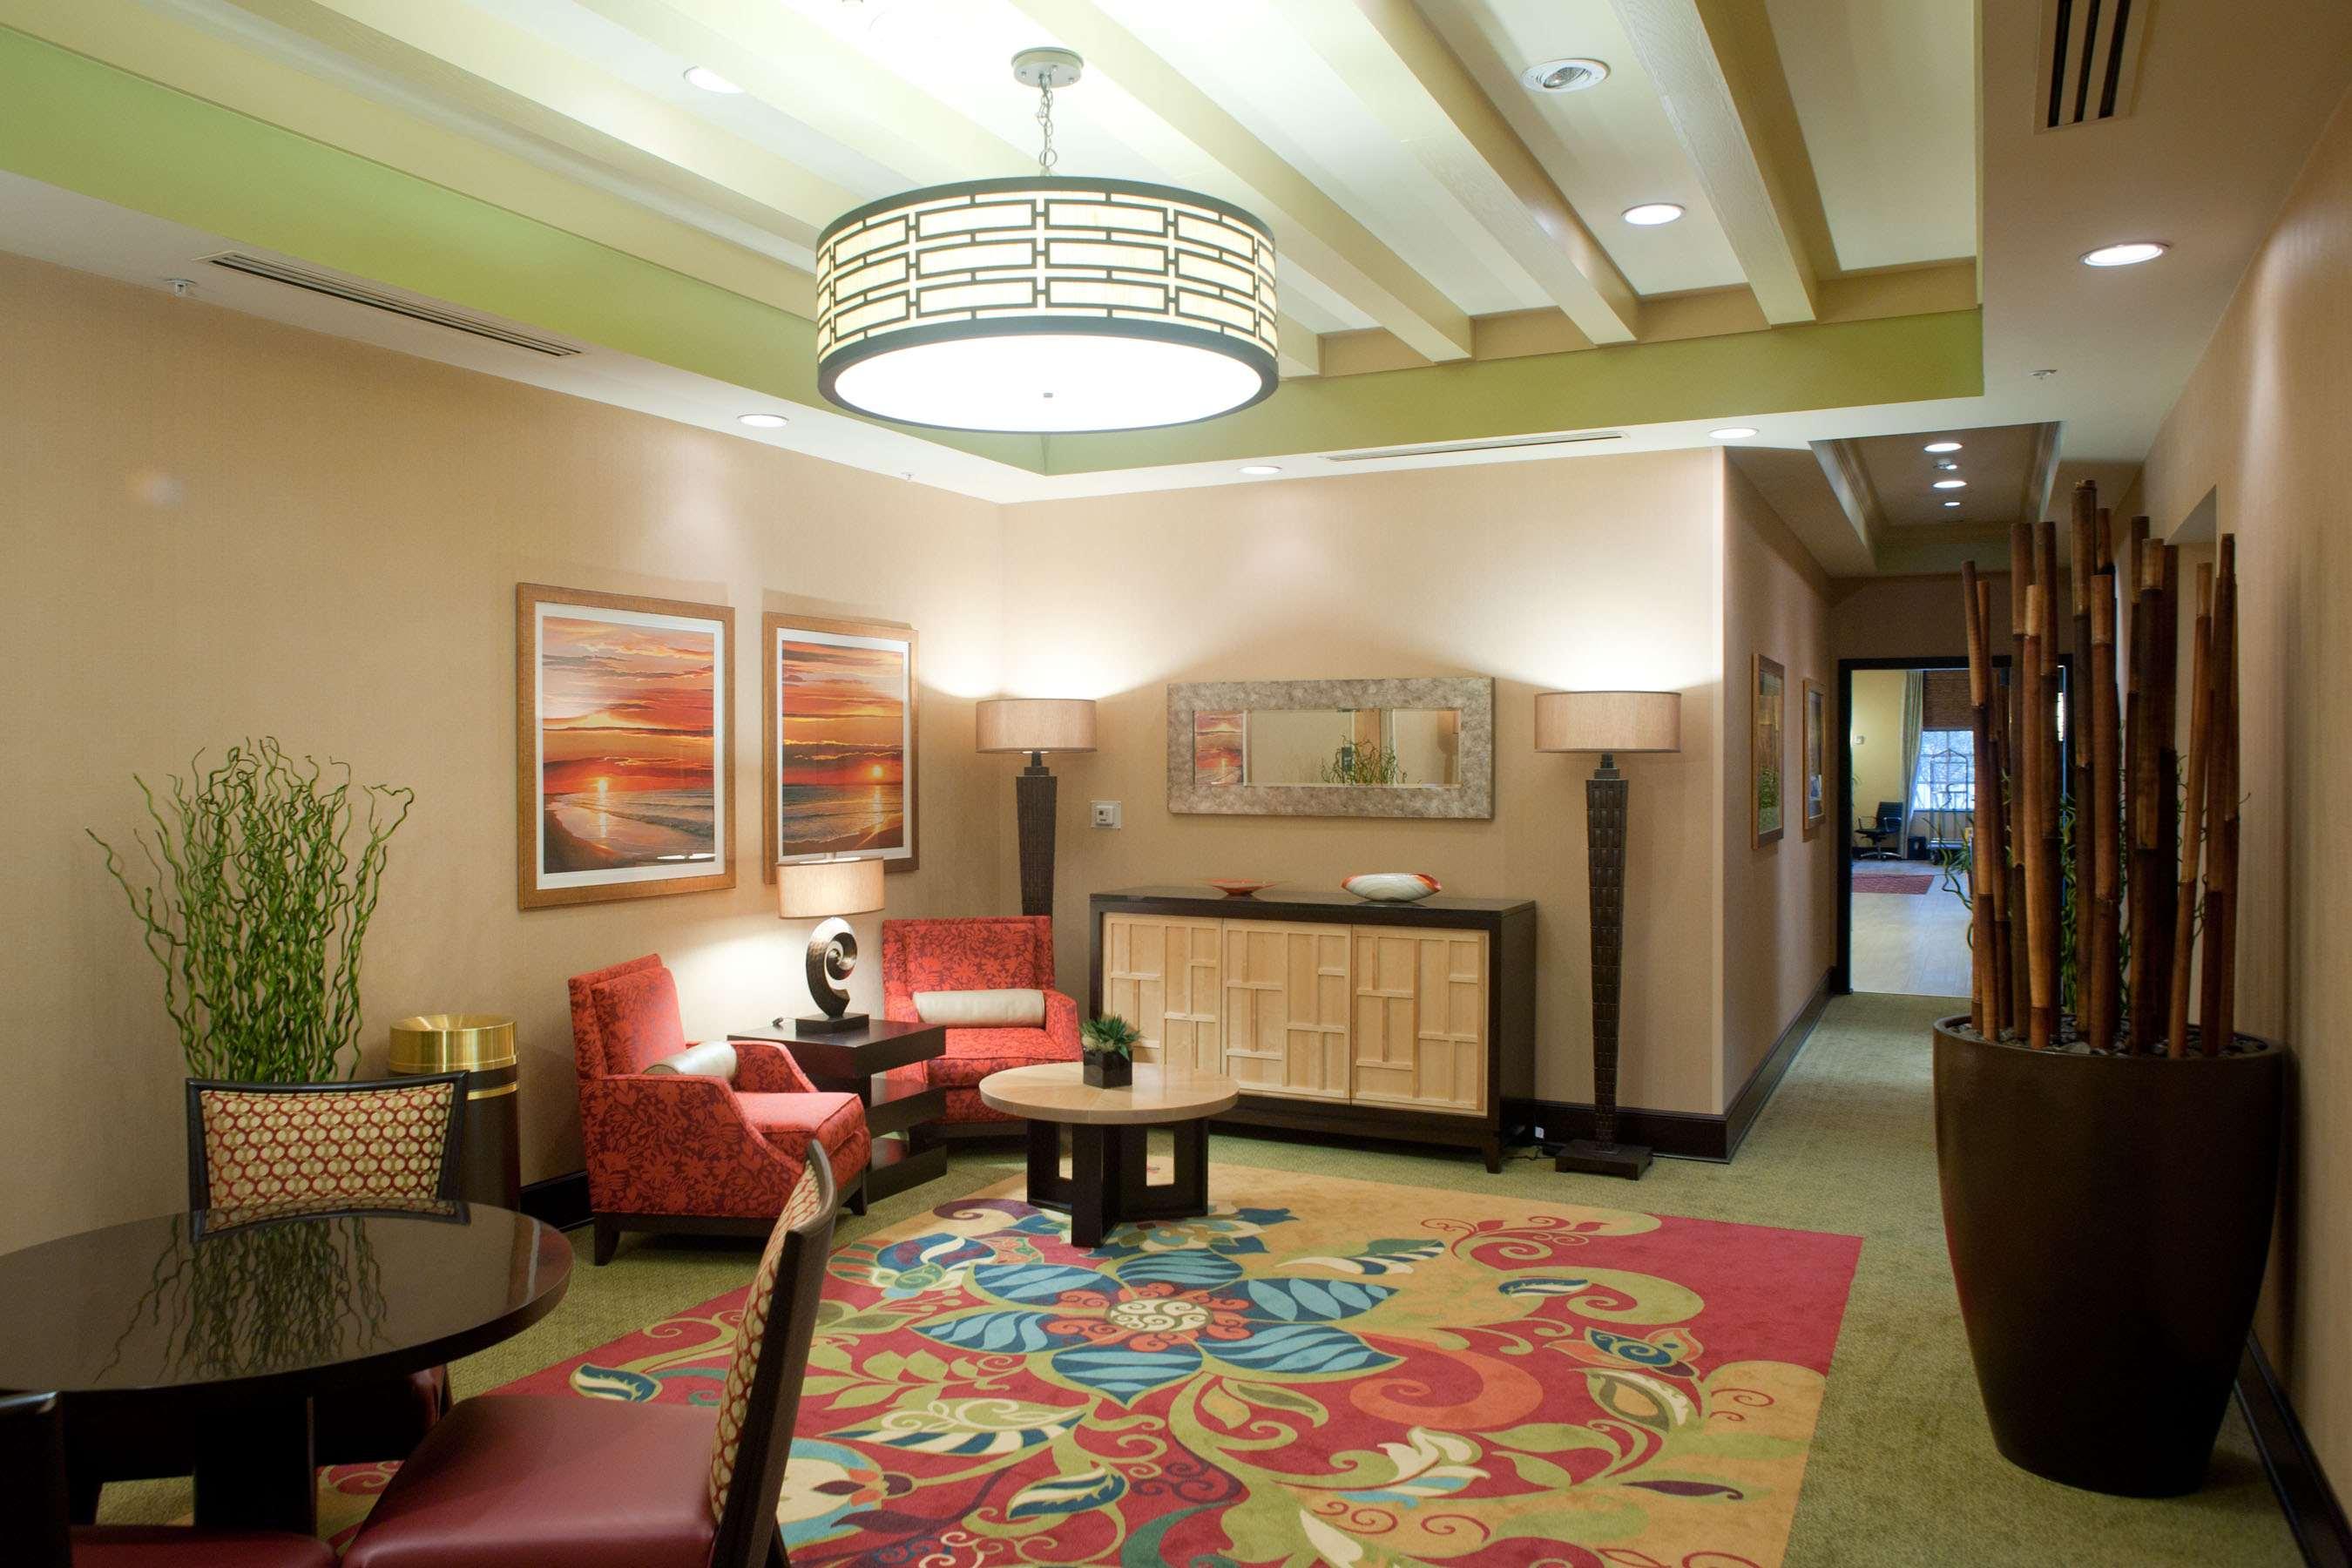 Hampton Inn & Suites St. Petersburg/Downtown image 22